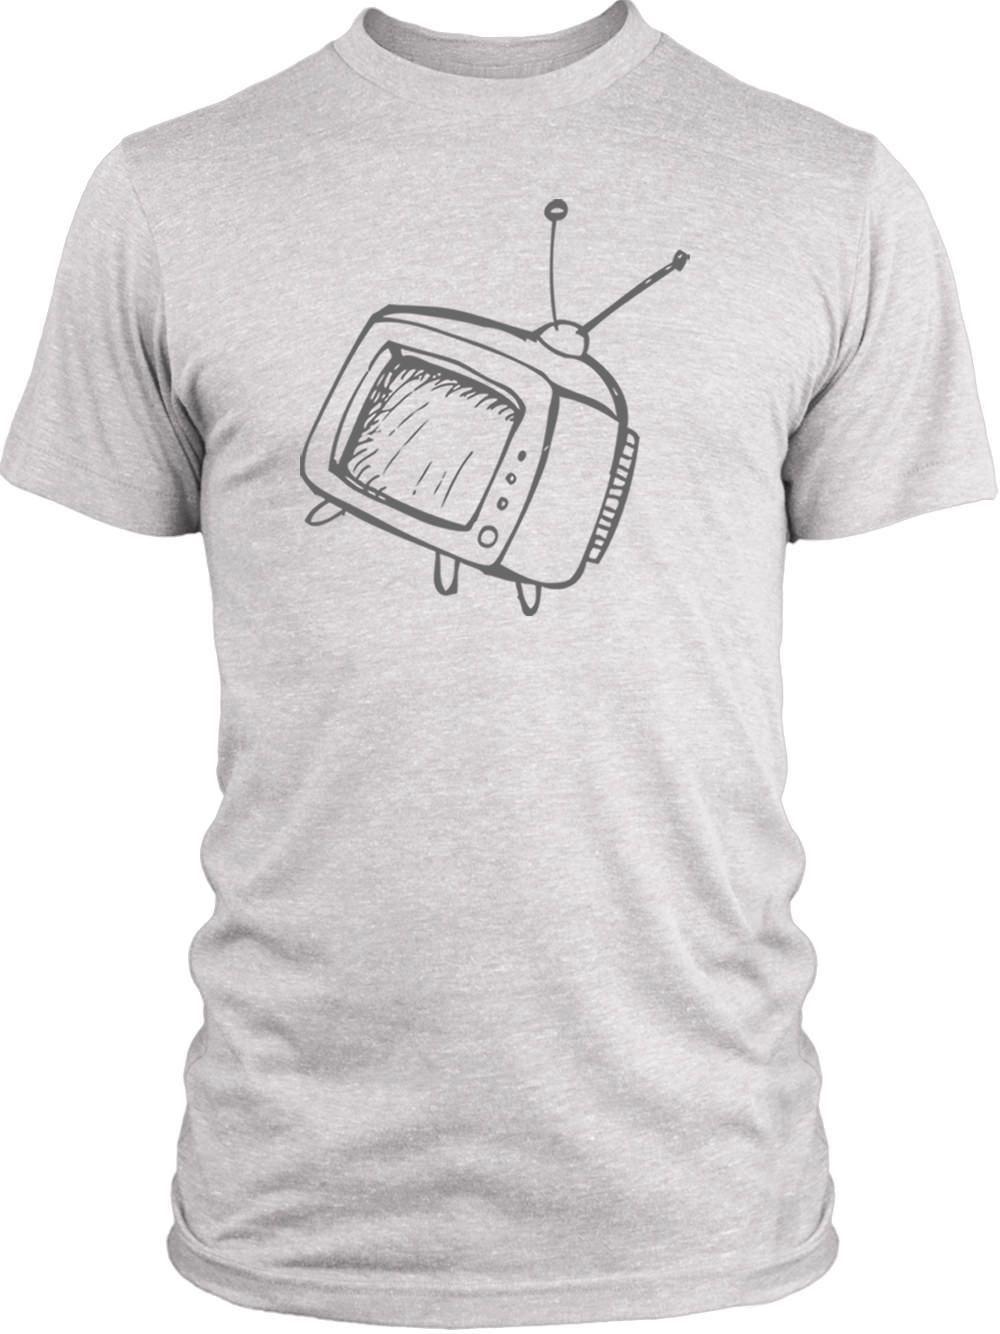 Big Texas Hand Drawn Television (Grey) Vintage Tri-Blend T-Shirt